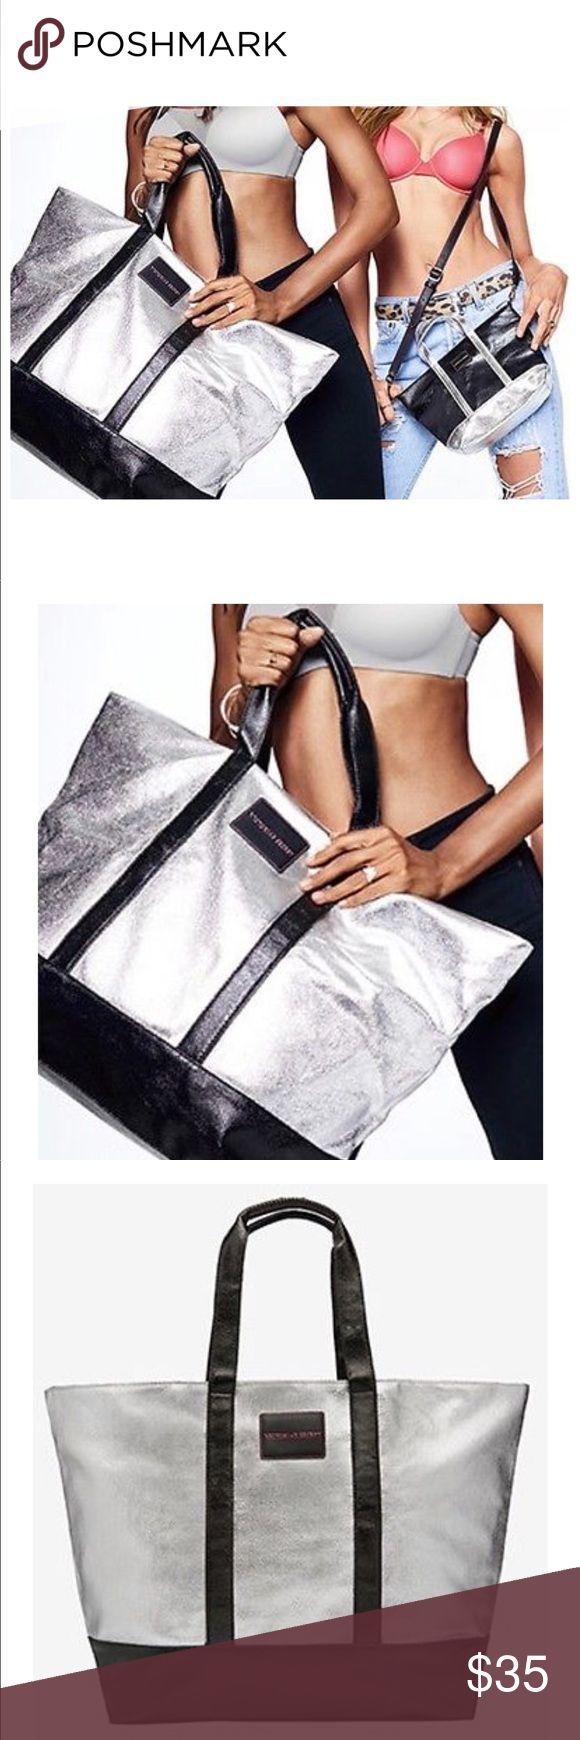 "Victoria Secret Weekender Bag Metallic silver and black Weekender Bag by Victoria Secret. The dimensions are 25"" L x 16"" W x 7"" H PINK Victoria's Secret Bags Travel Bags"